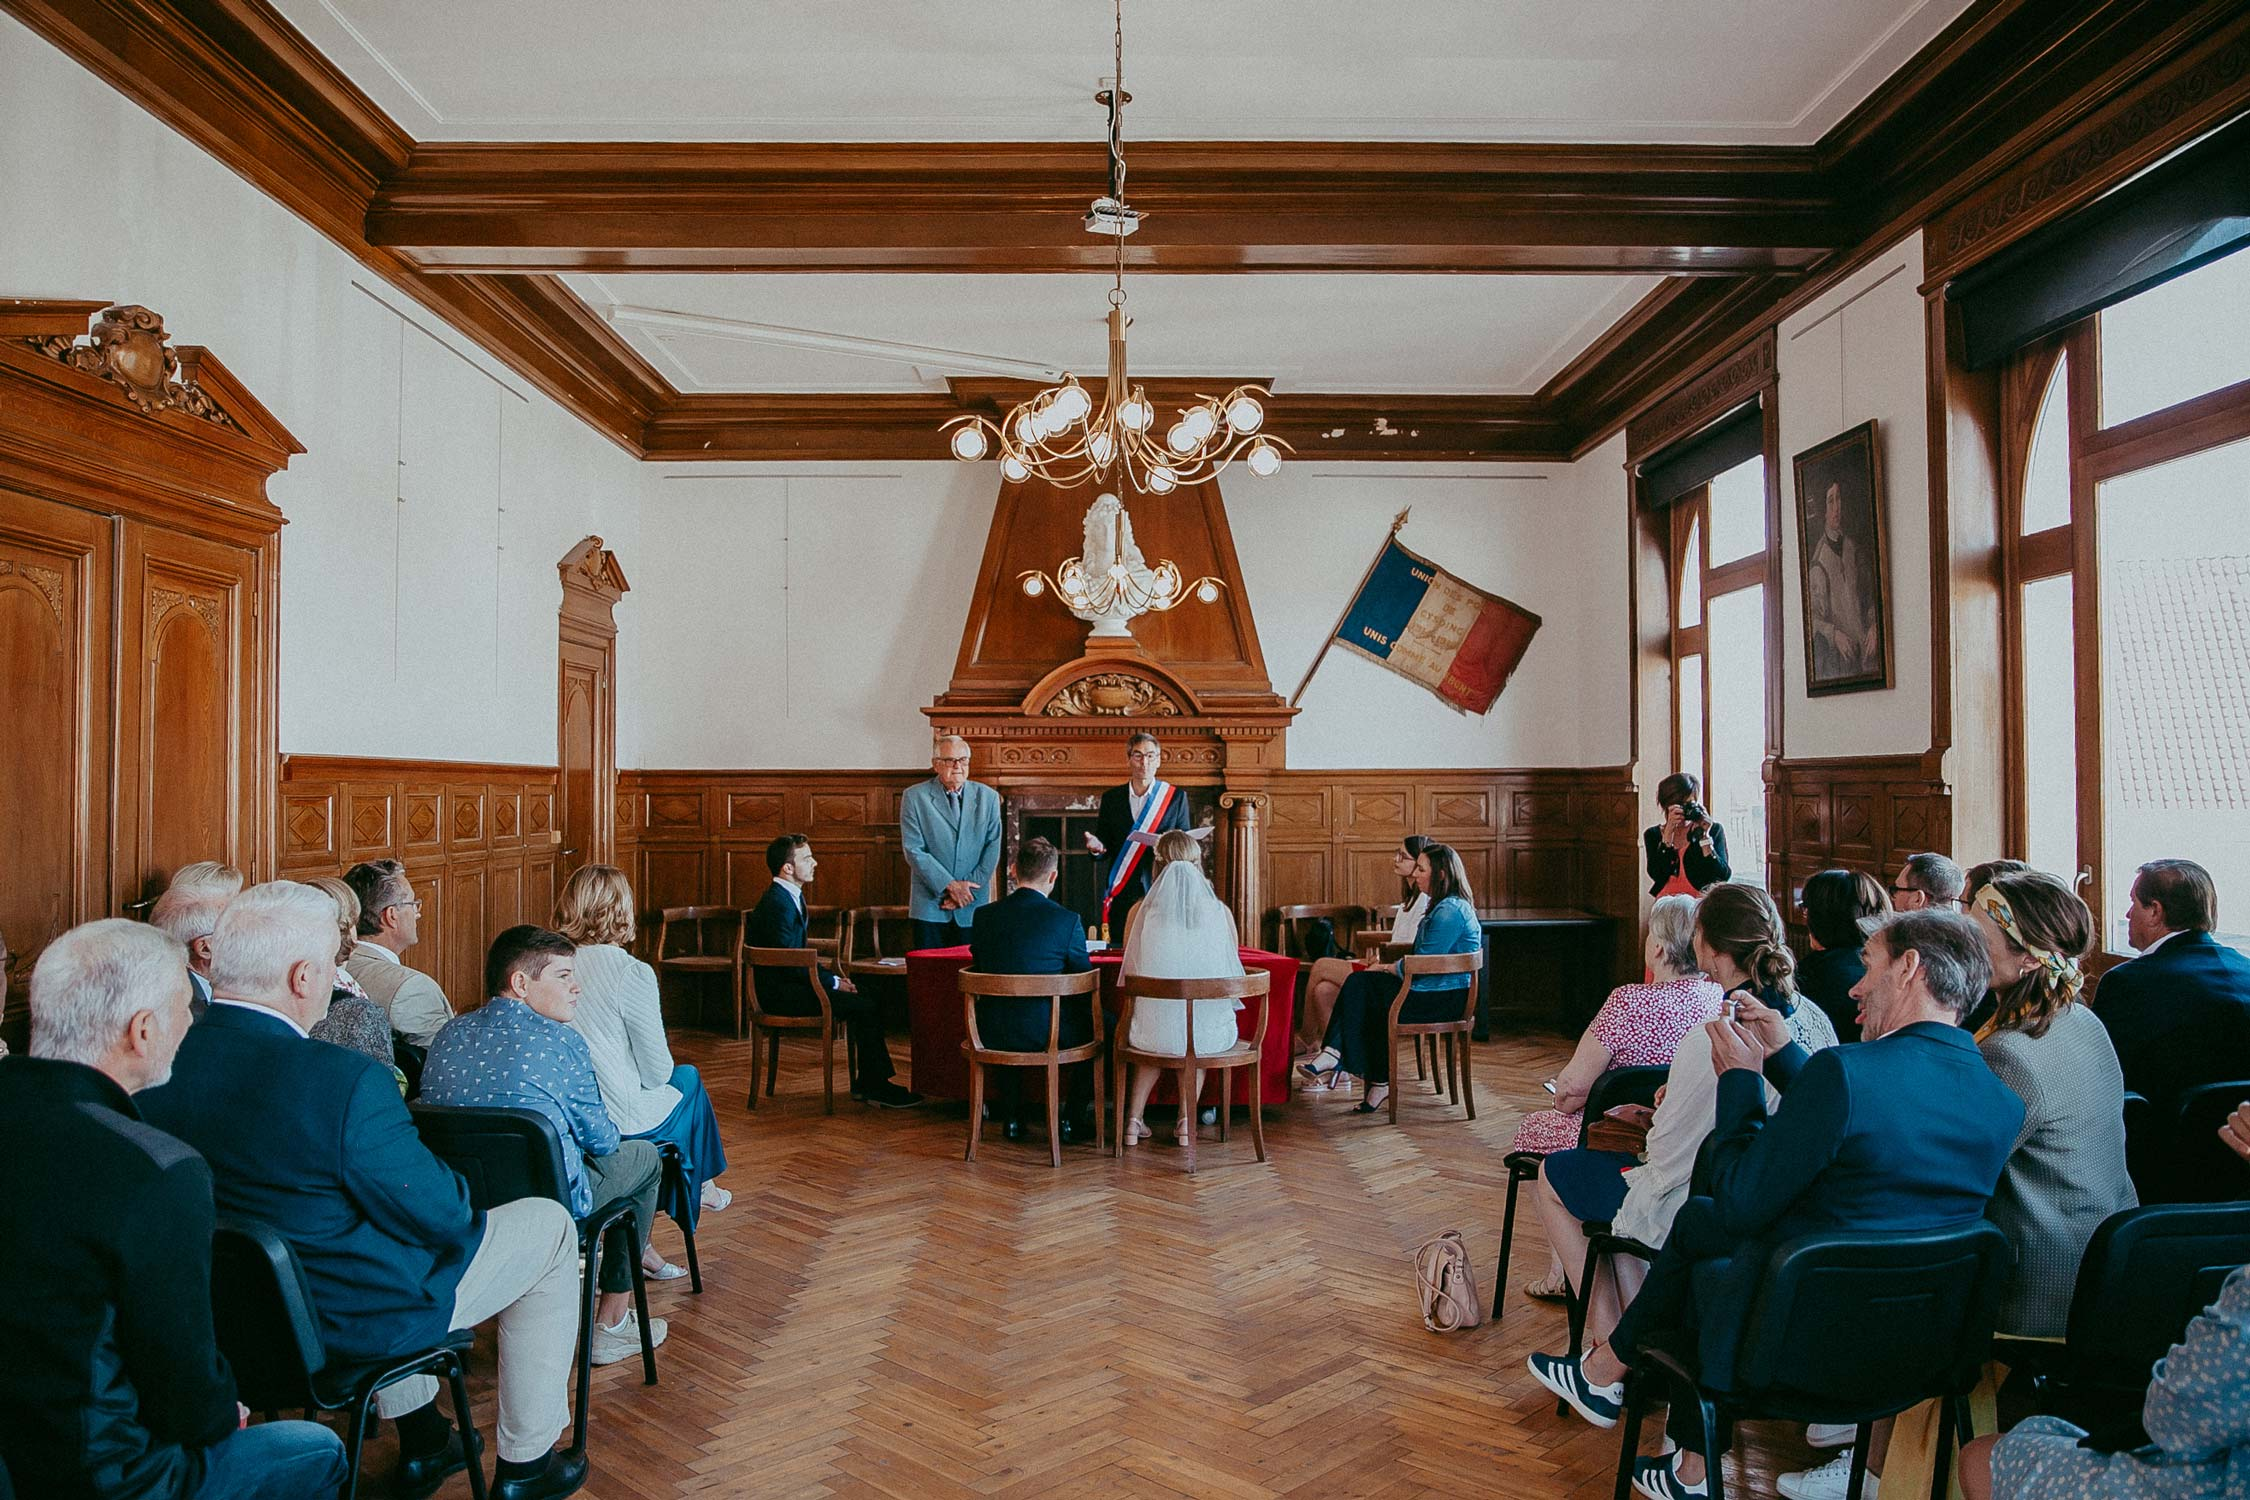 photographe-mariage-ceremonie-civile-mairie-cysoing